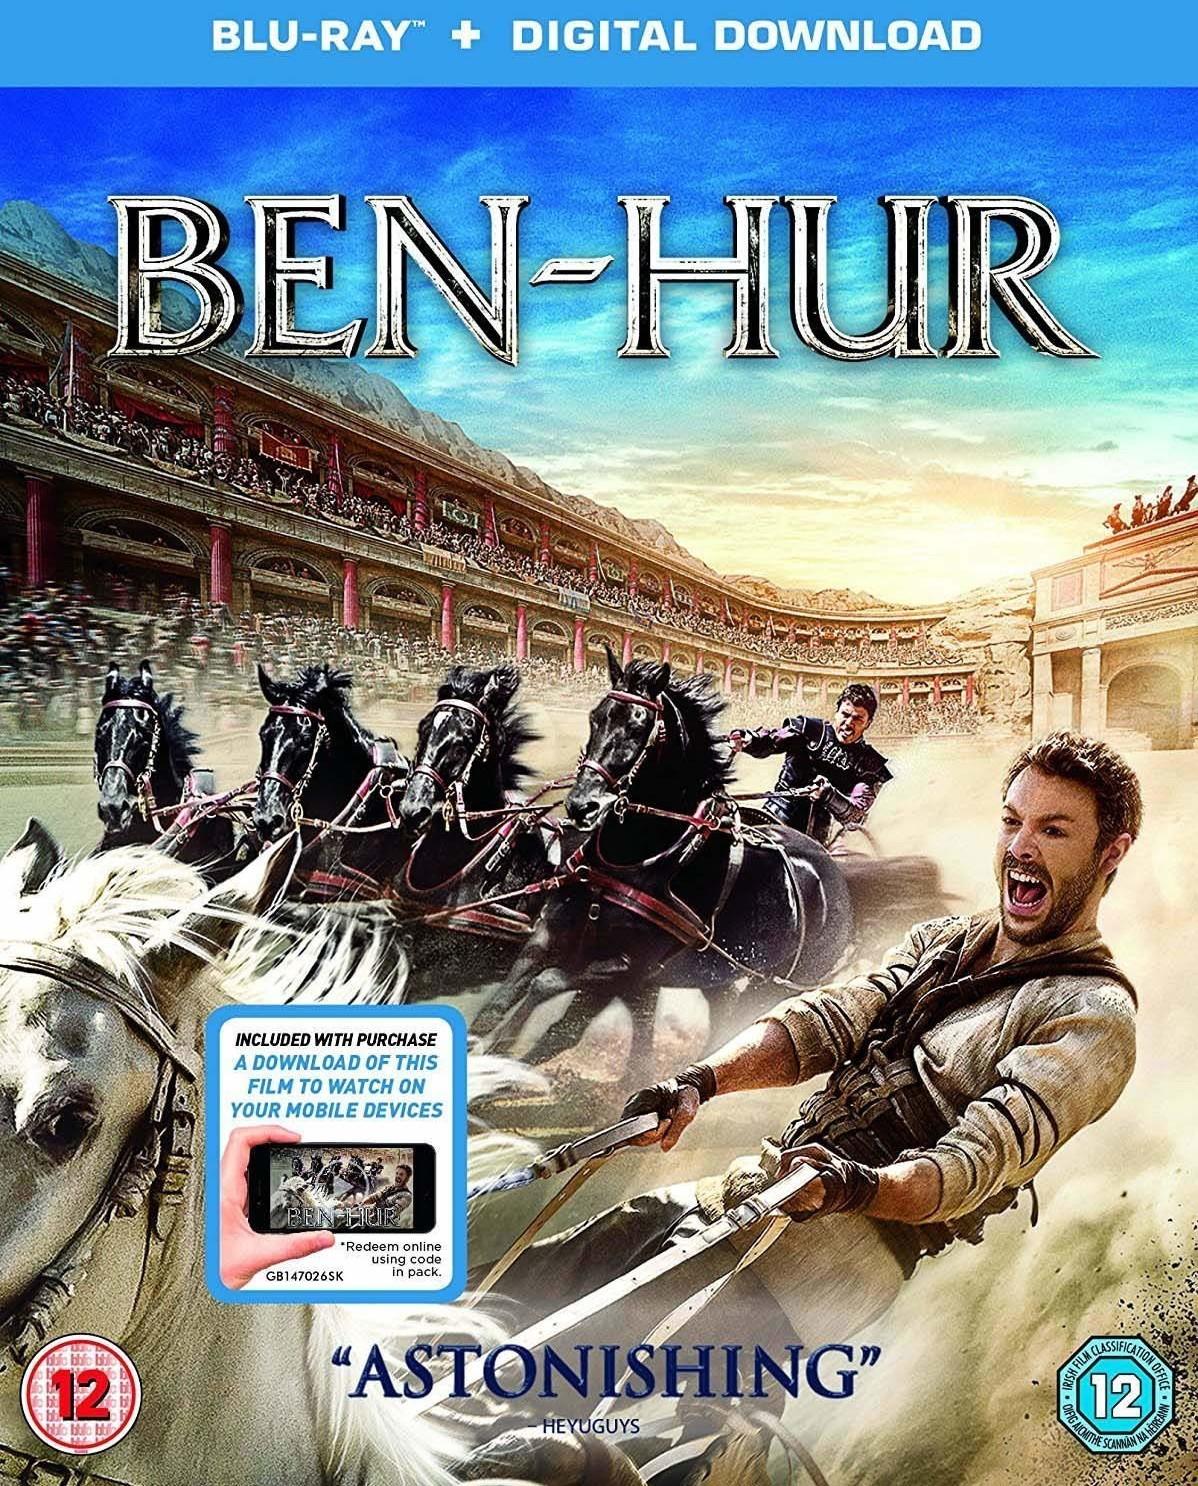 Image of Ben Hur (Digital Download) [Blu-ray] [2016] [Region Free]